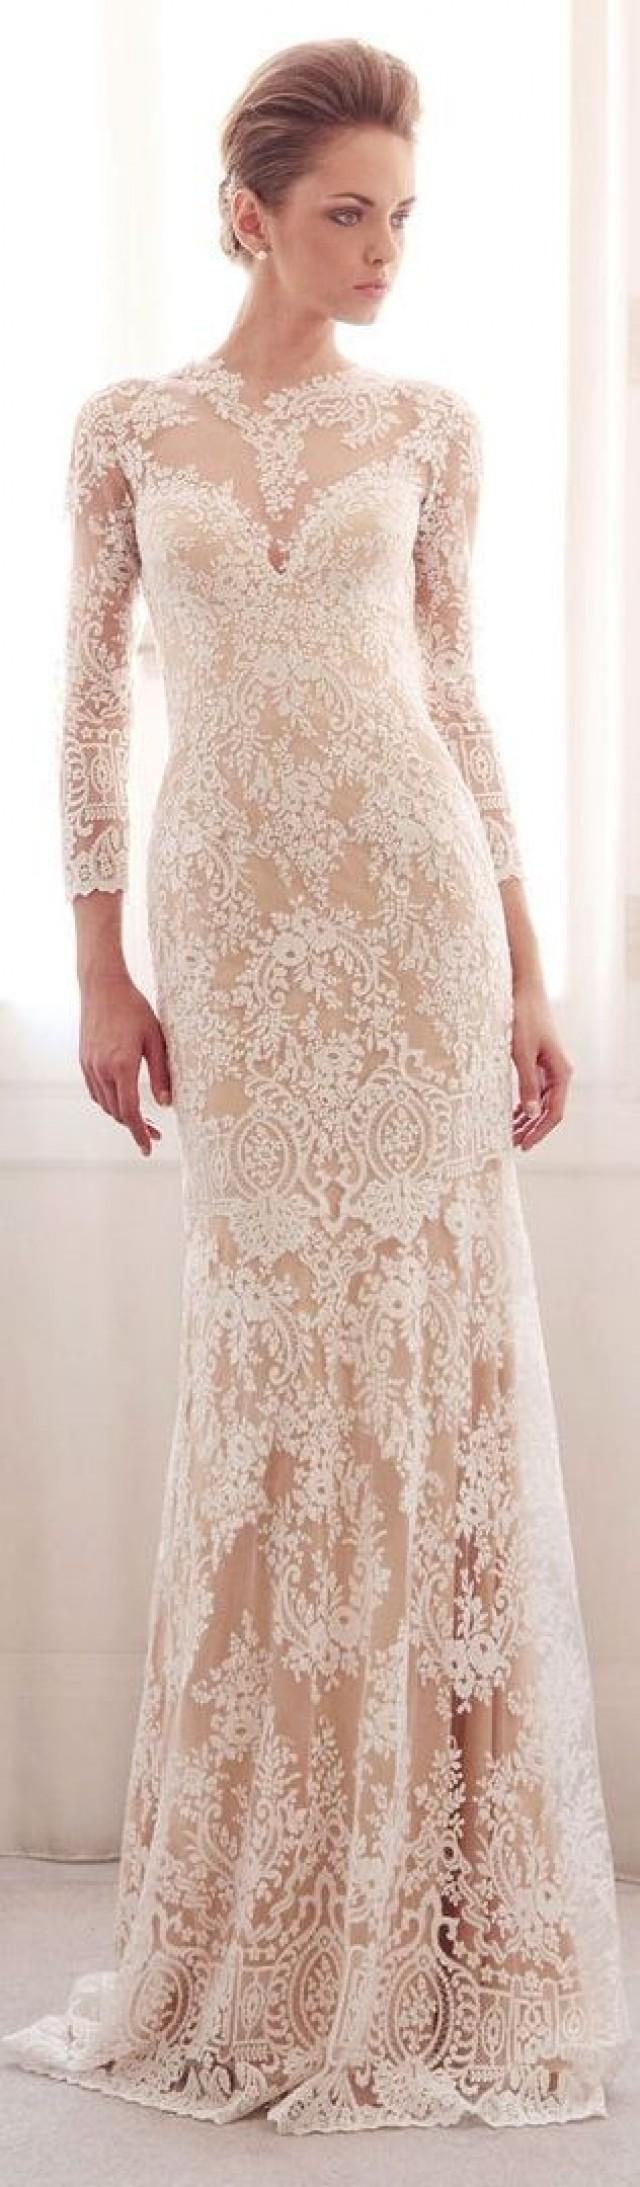 Gemy Maalouf Bridal S/S 2014 longsleeved